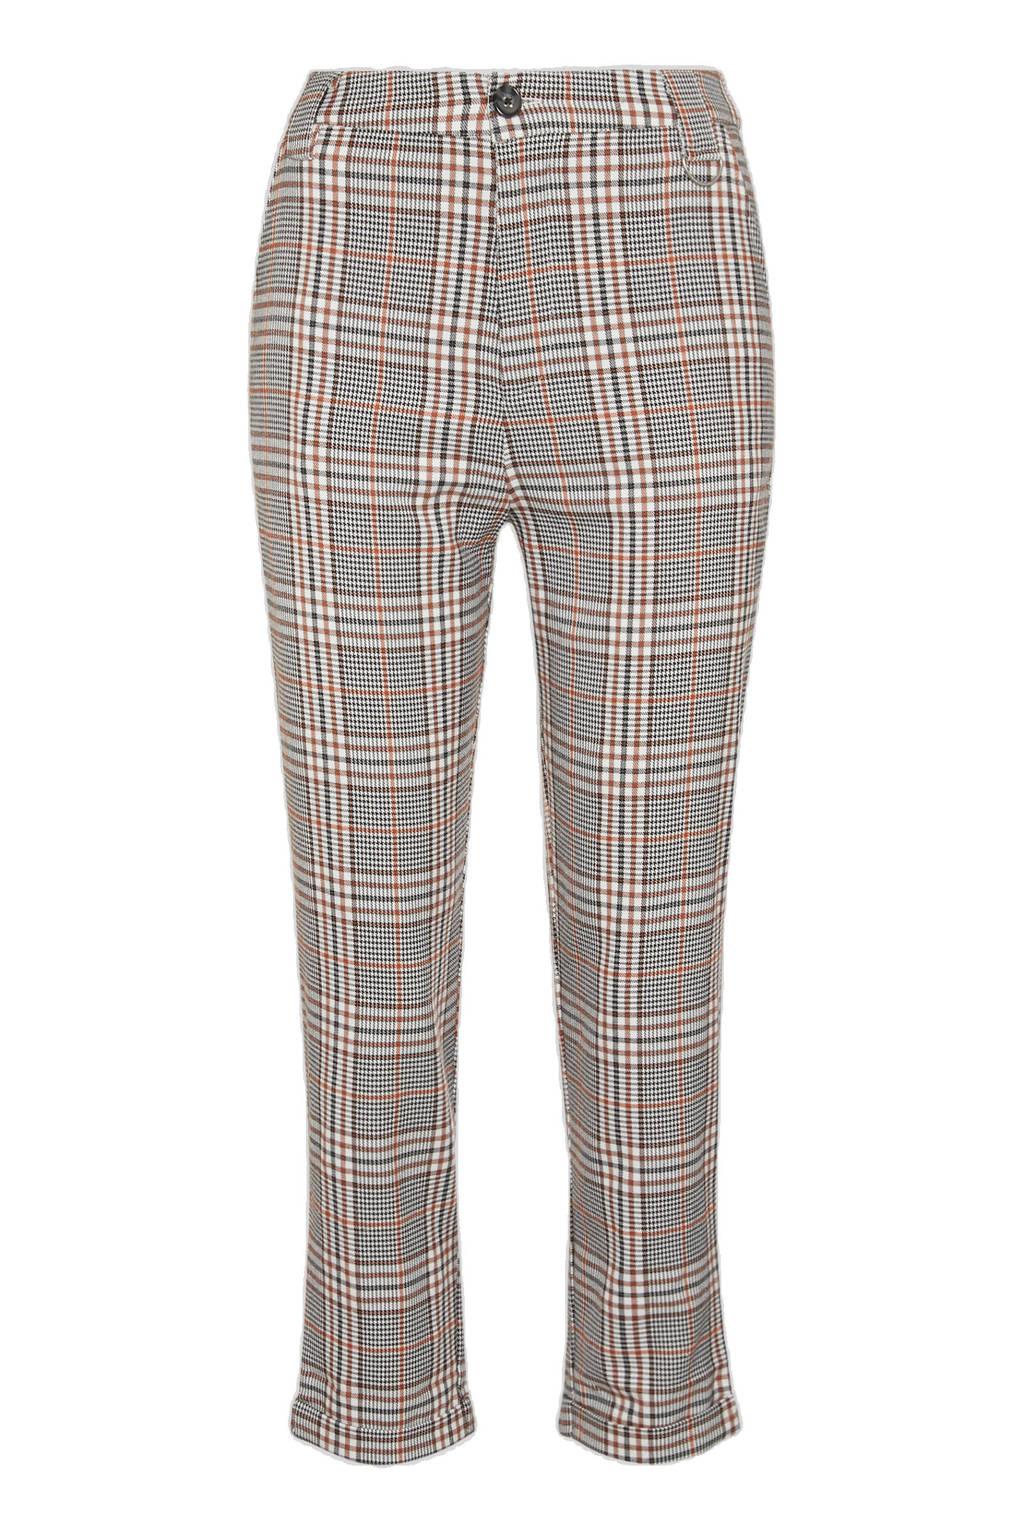 C&A Clockhouse geruite slim fit broek zwart/wit/bruin, Zwart/wit/bruin